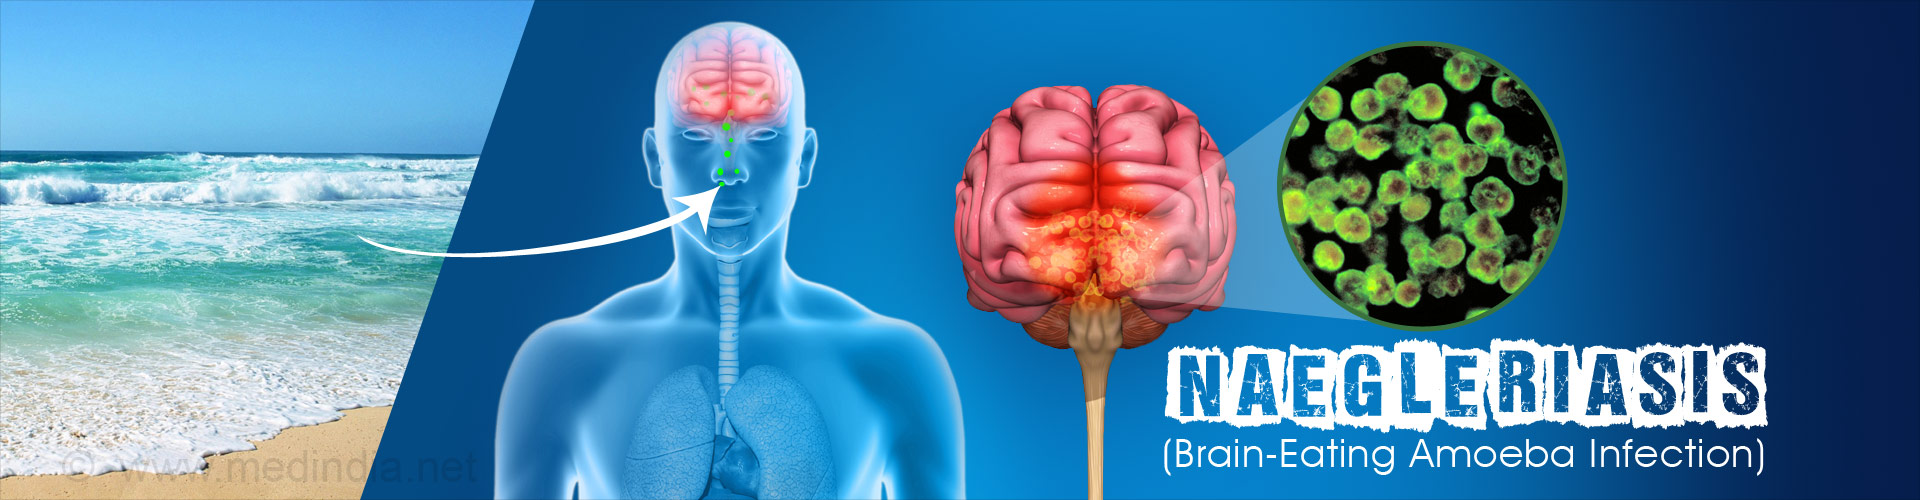 Naegleriasis (Brain-Eating Amoeba Infection) - Causes, Symptoms, Prevention